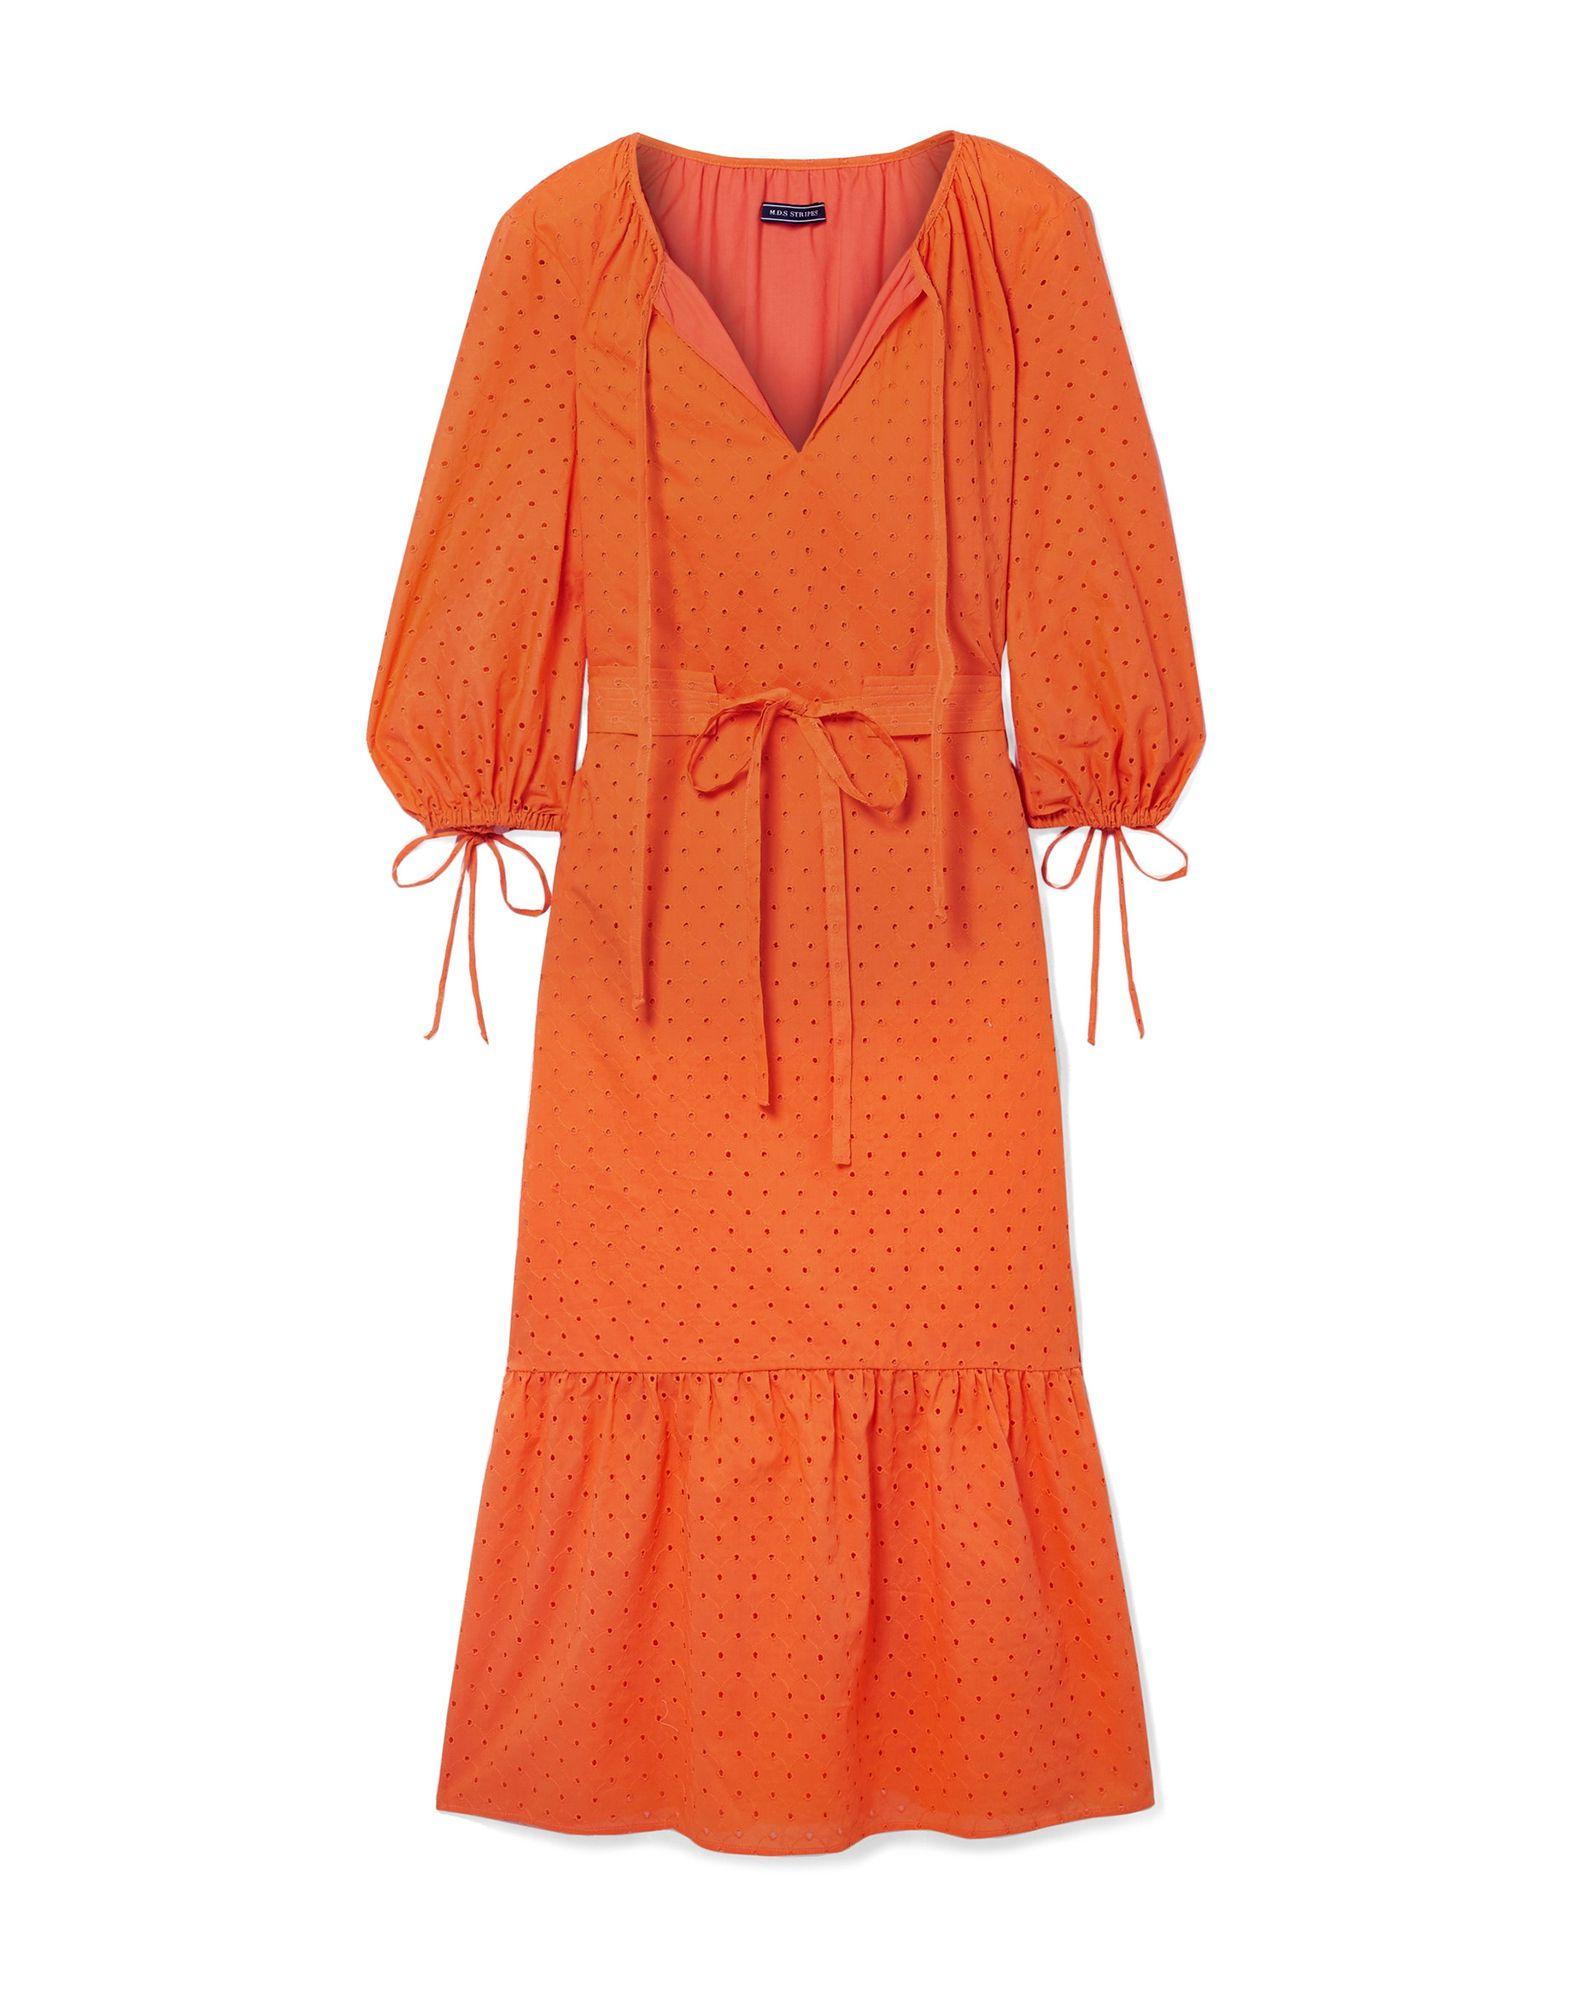 платье d MARK D. SIKES Платье миди